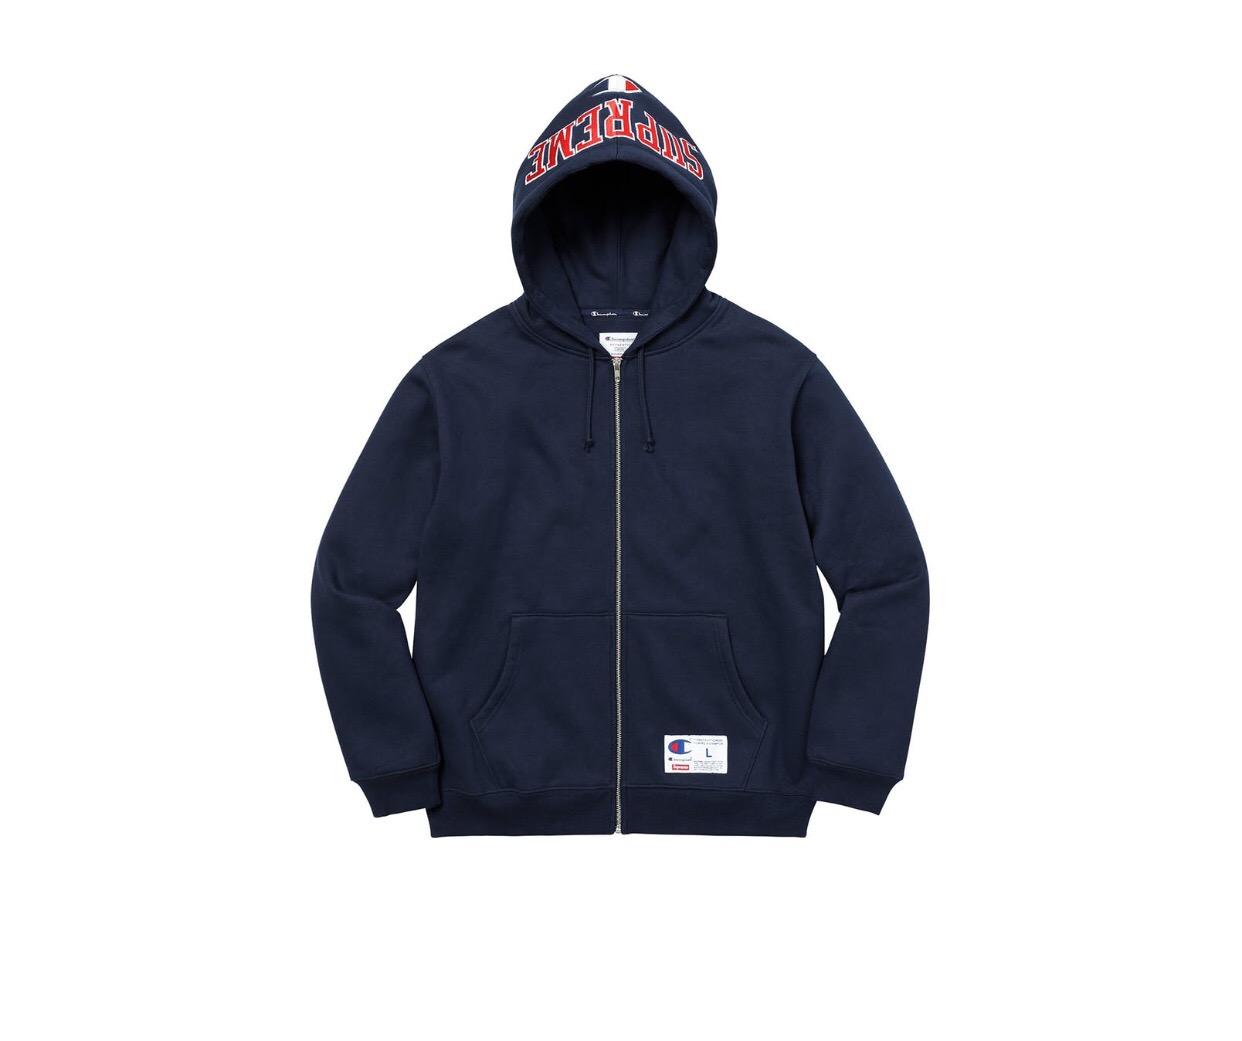 champion zip up hoodie